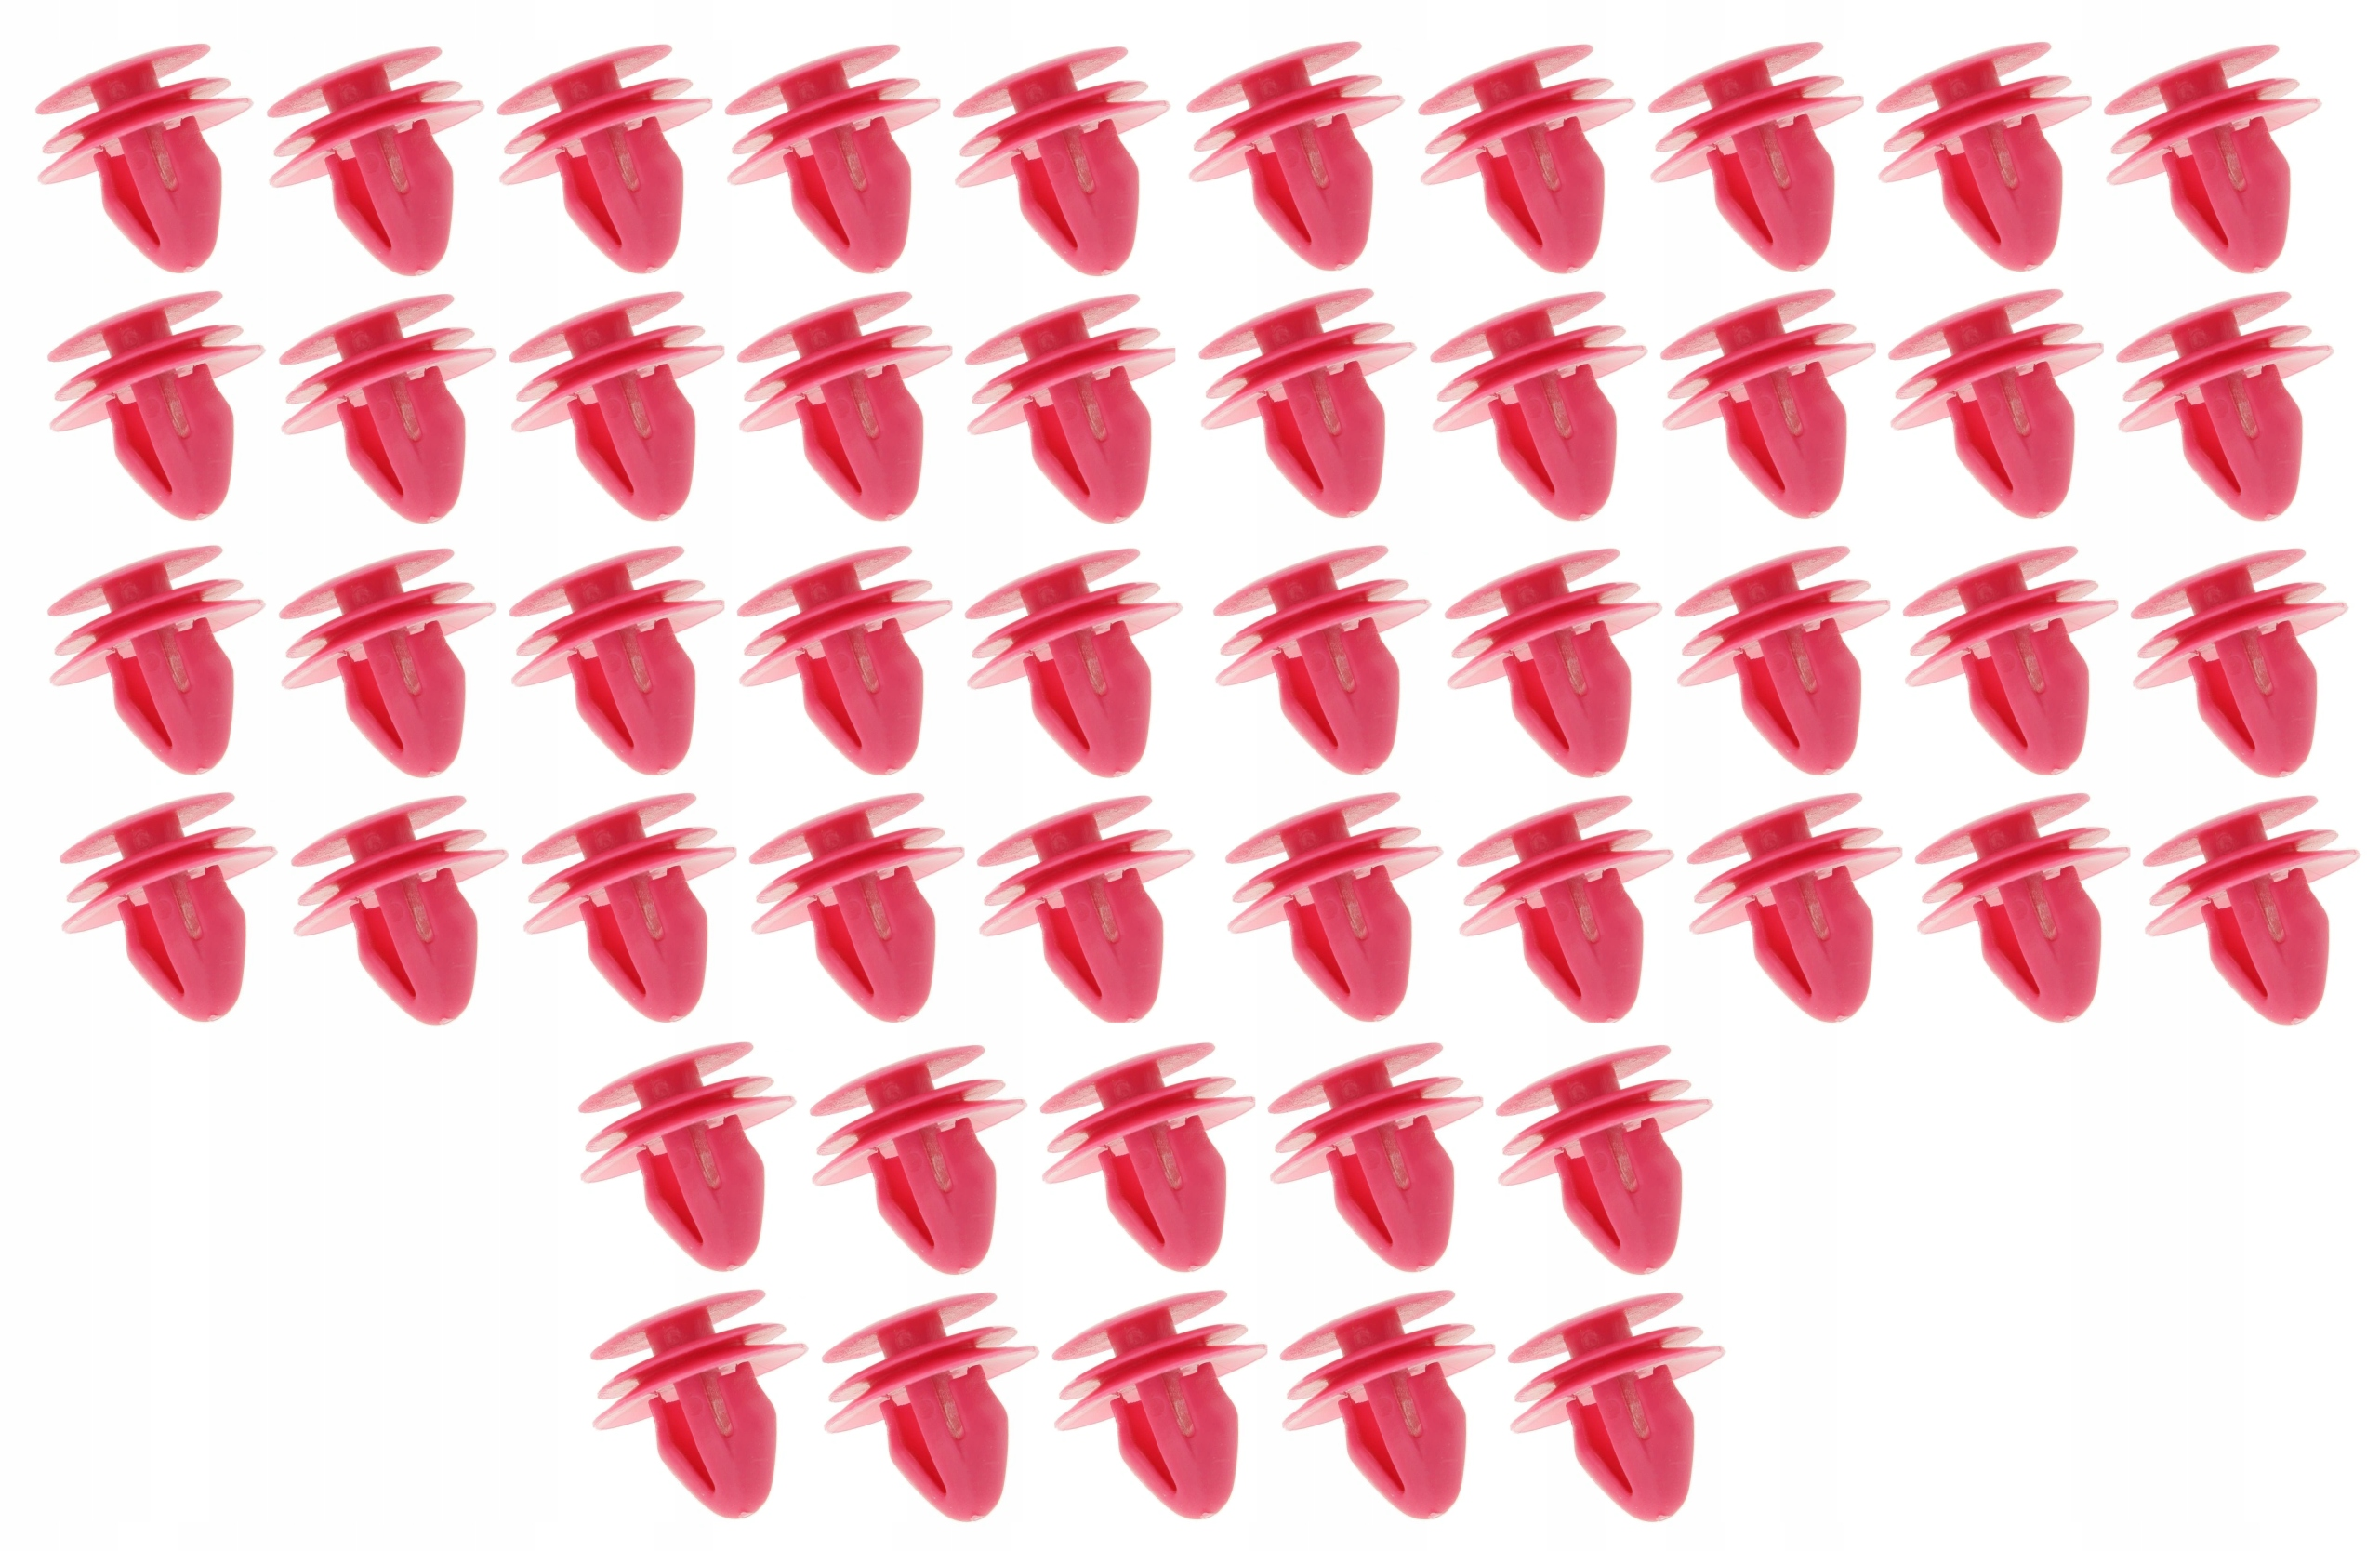 [HYUNDAIЗАКЛЕПКА МОЛДИНГИ BLOTNIKA NAKLADKI 50 SZTUK из Польши]изображение